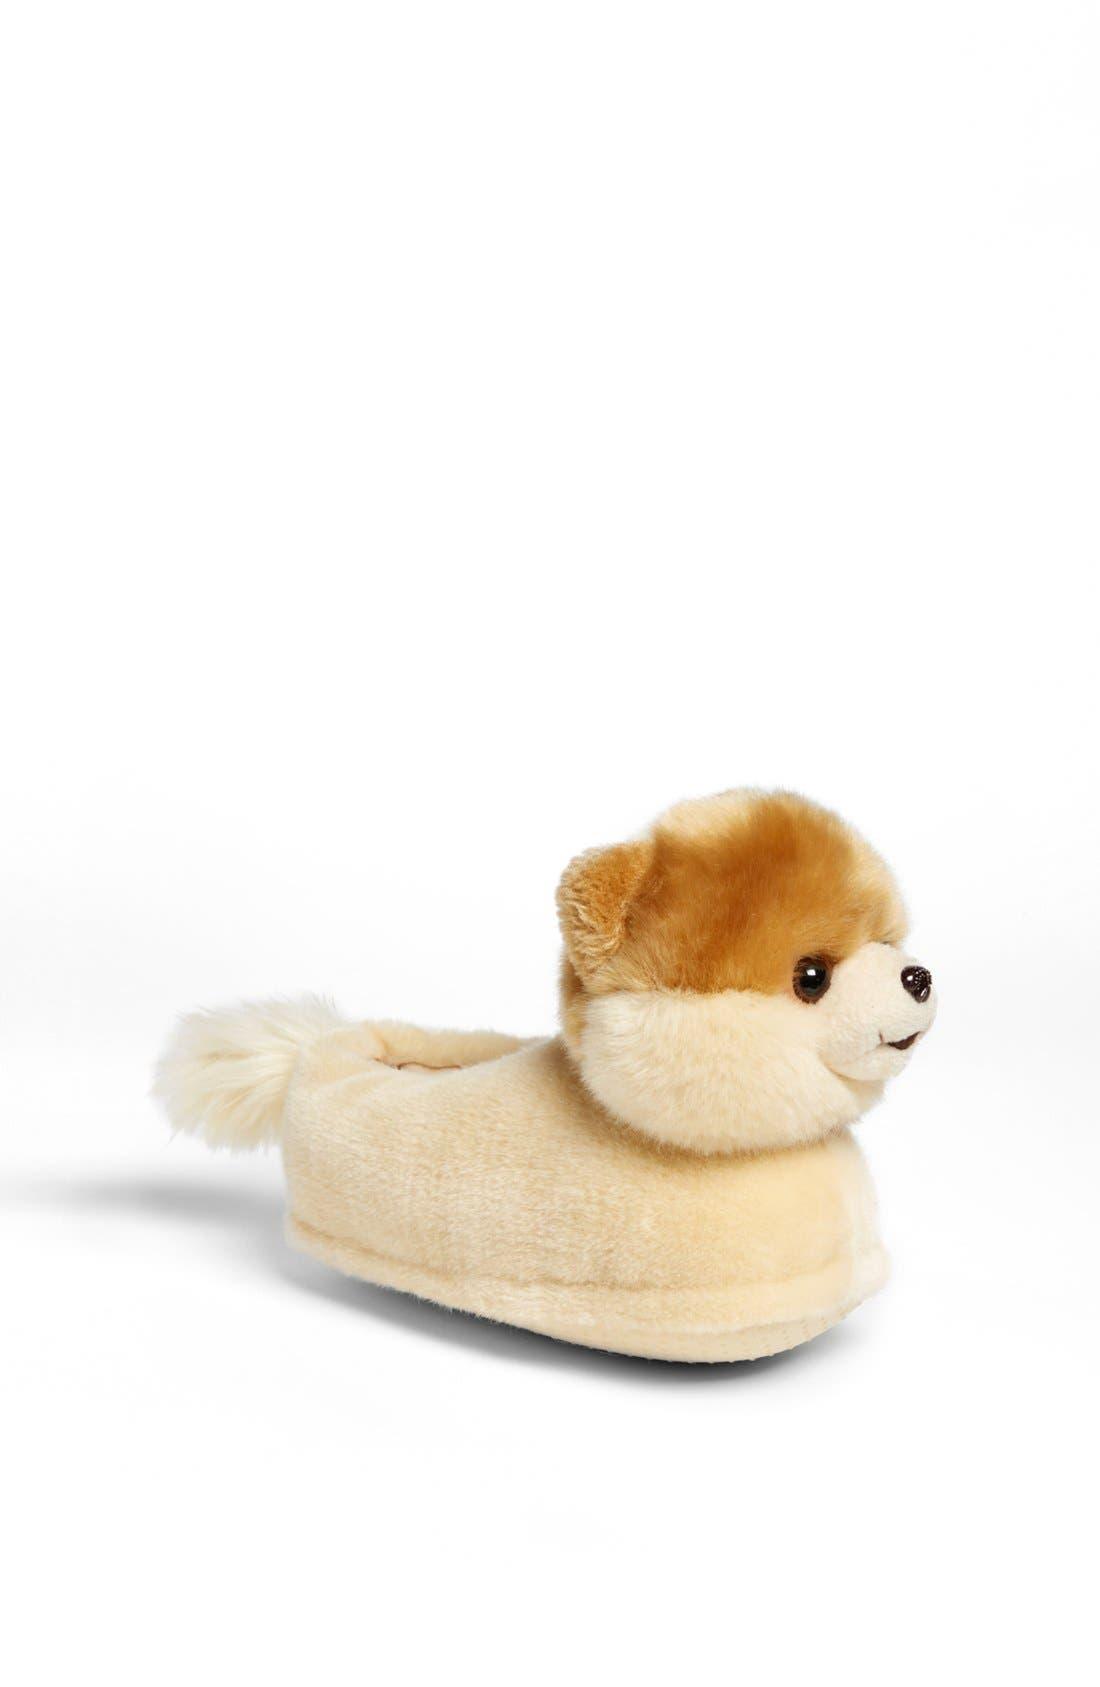 SG FOOTWEAR, 'Boo - The World's Cutest Dog' Slipper, Main thumbnail 1, color, 200